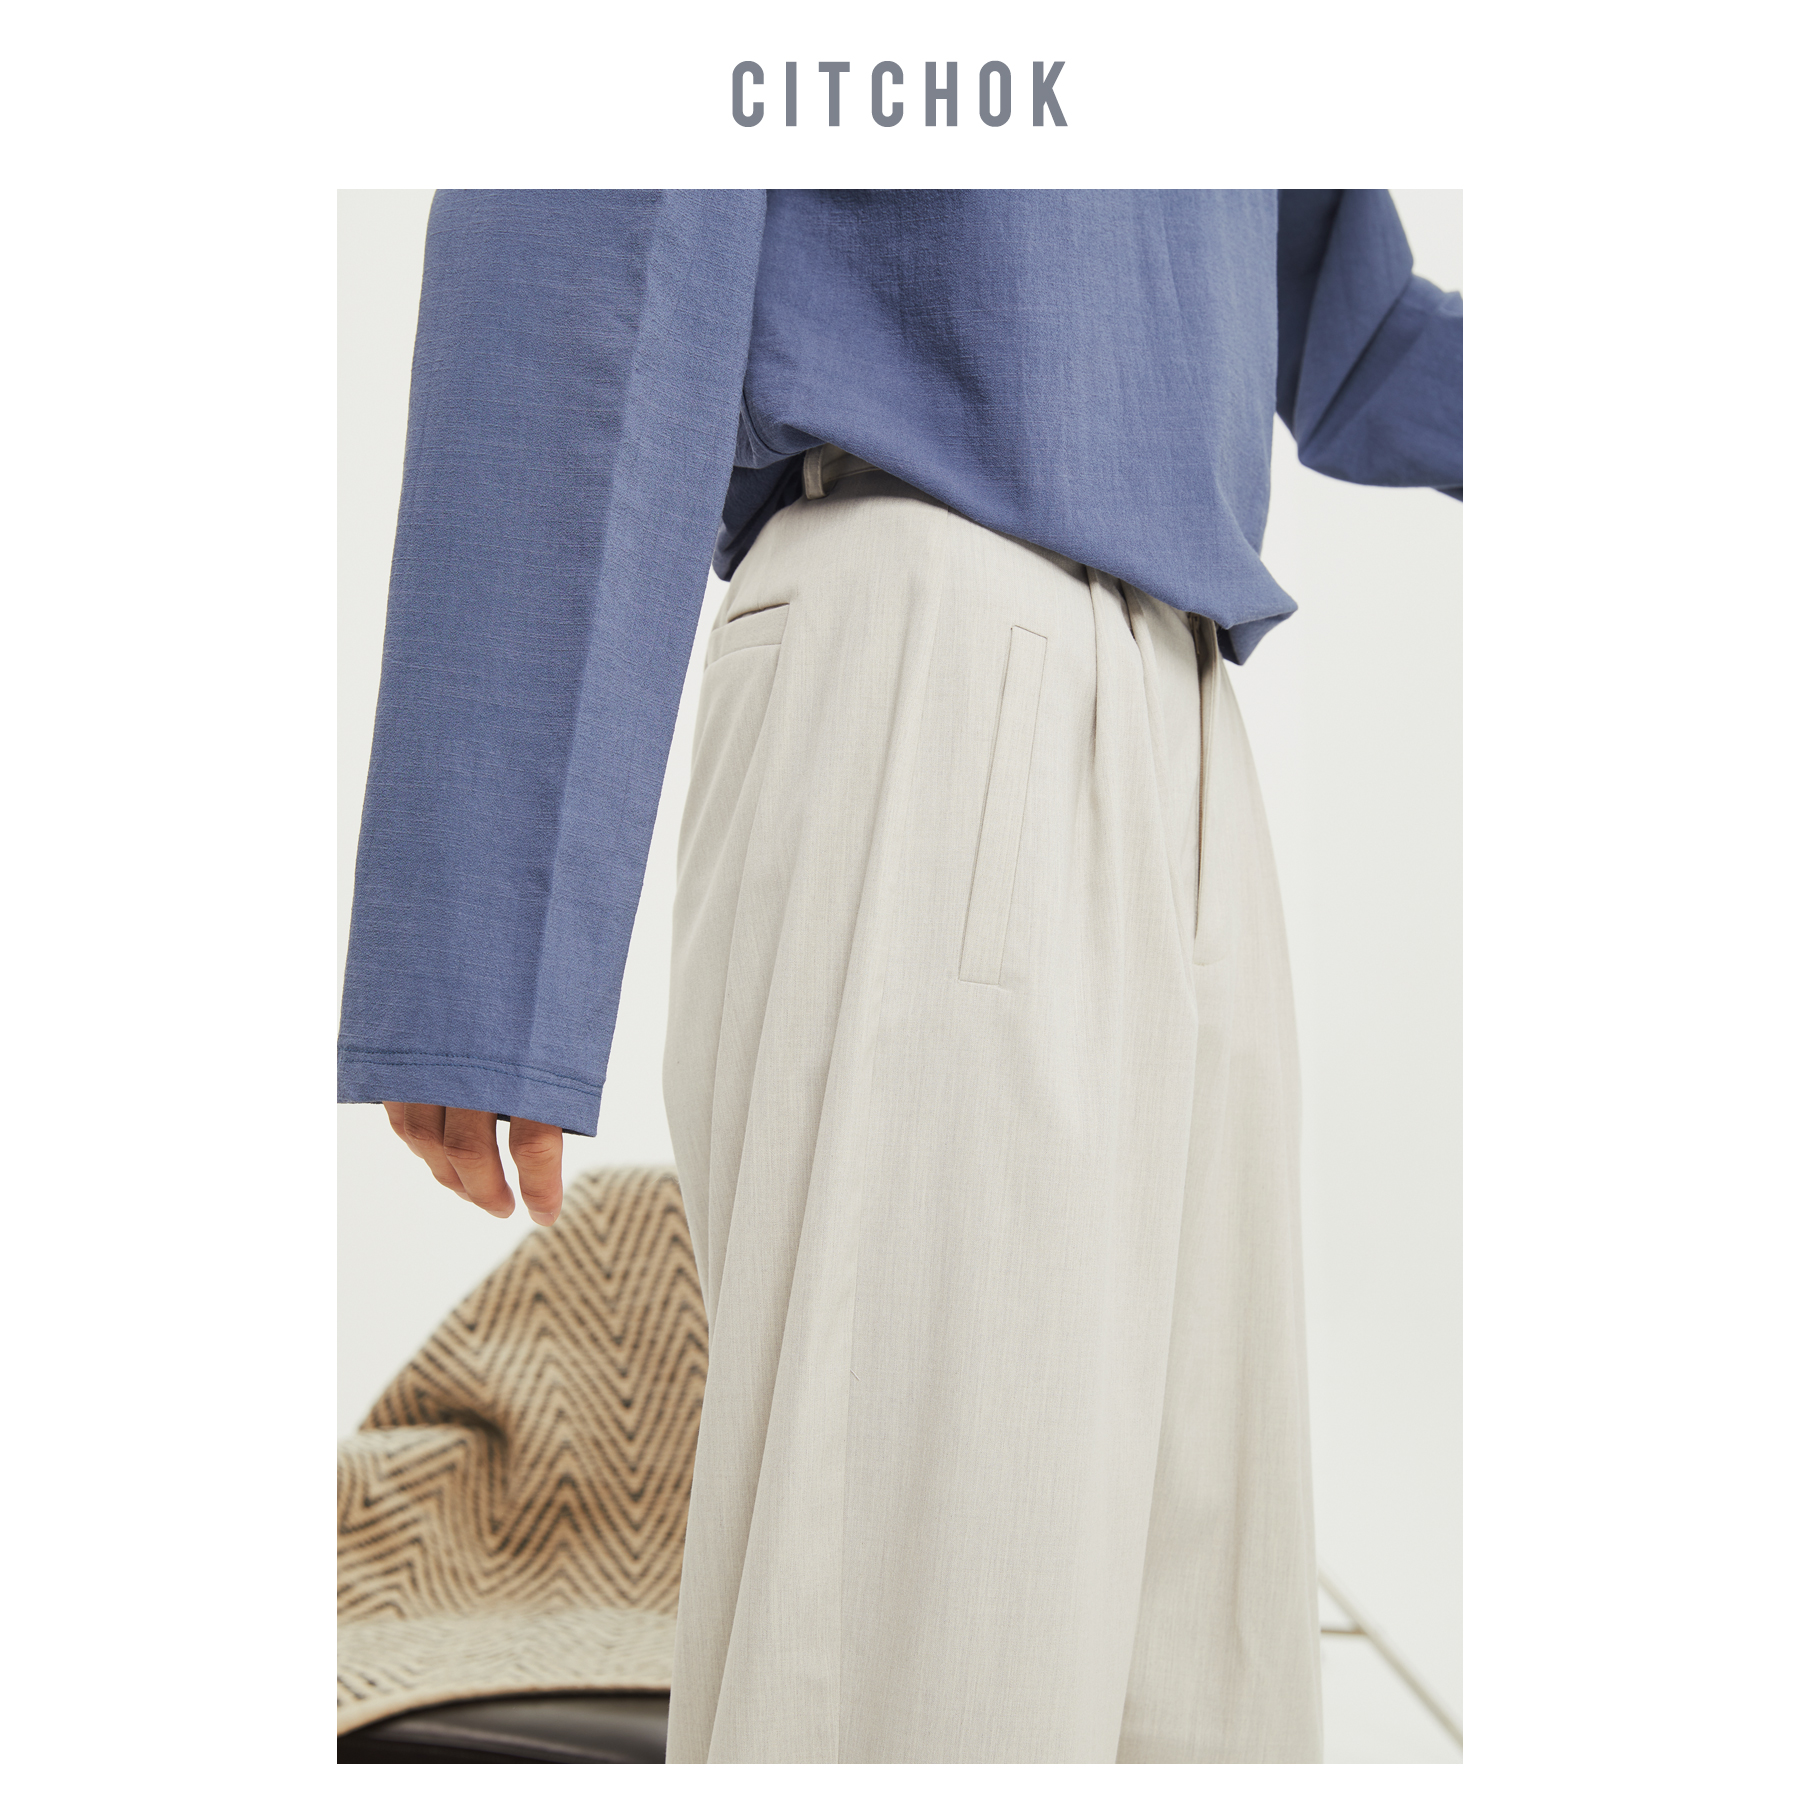 CITCHOK原创设计   浅灰色 chic风 宽松休闲长裤男直筒